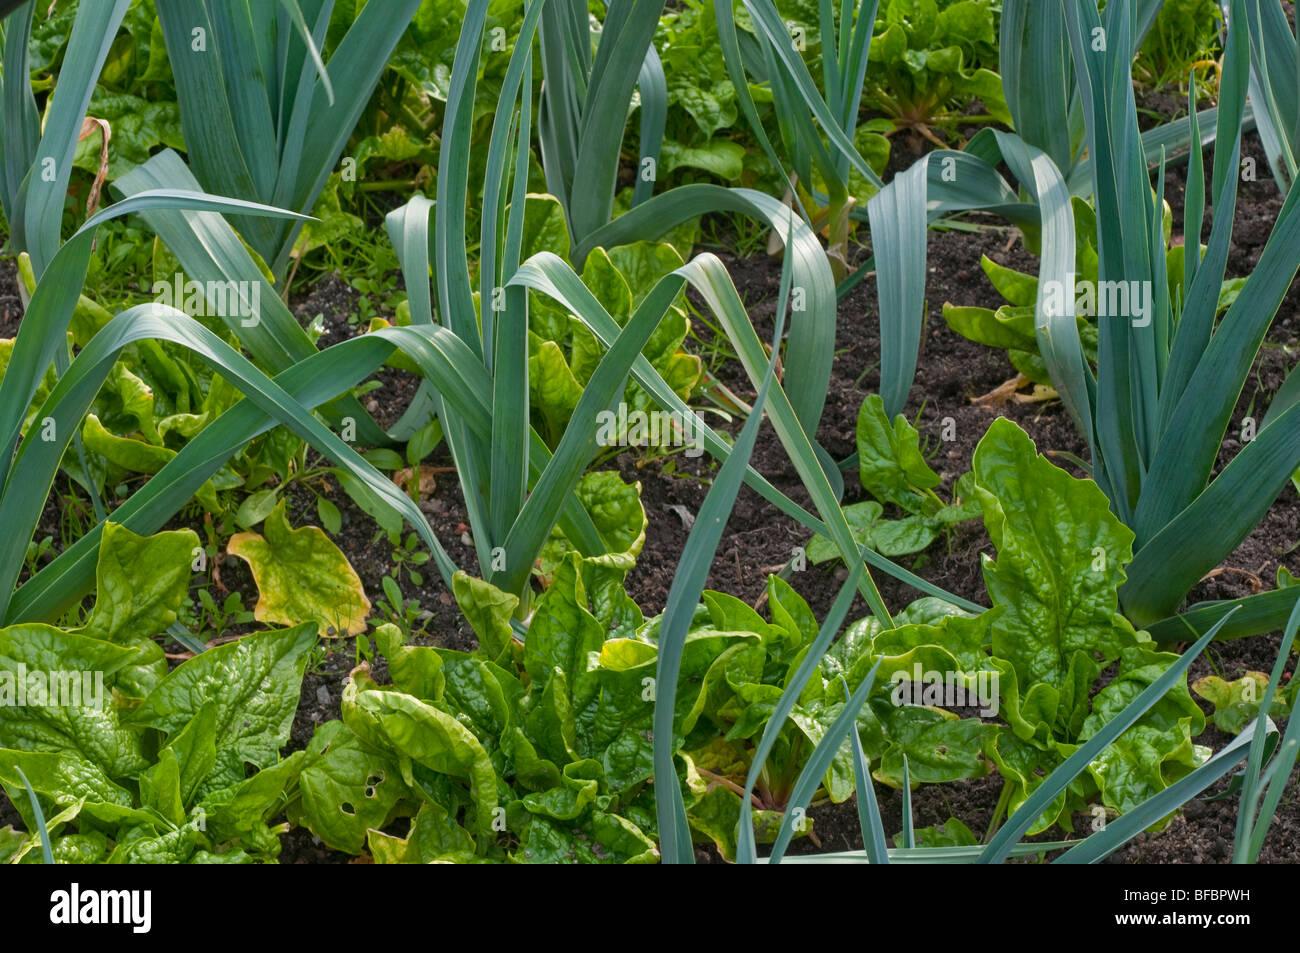 Companion Planting High Resolution Stock Photography and ... Leek Companion Plants